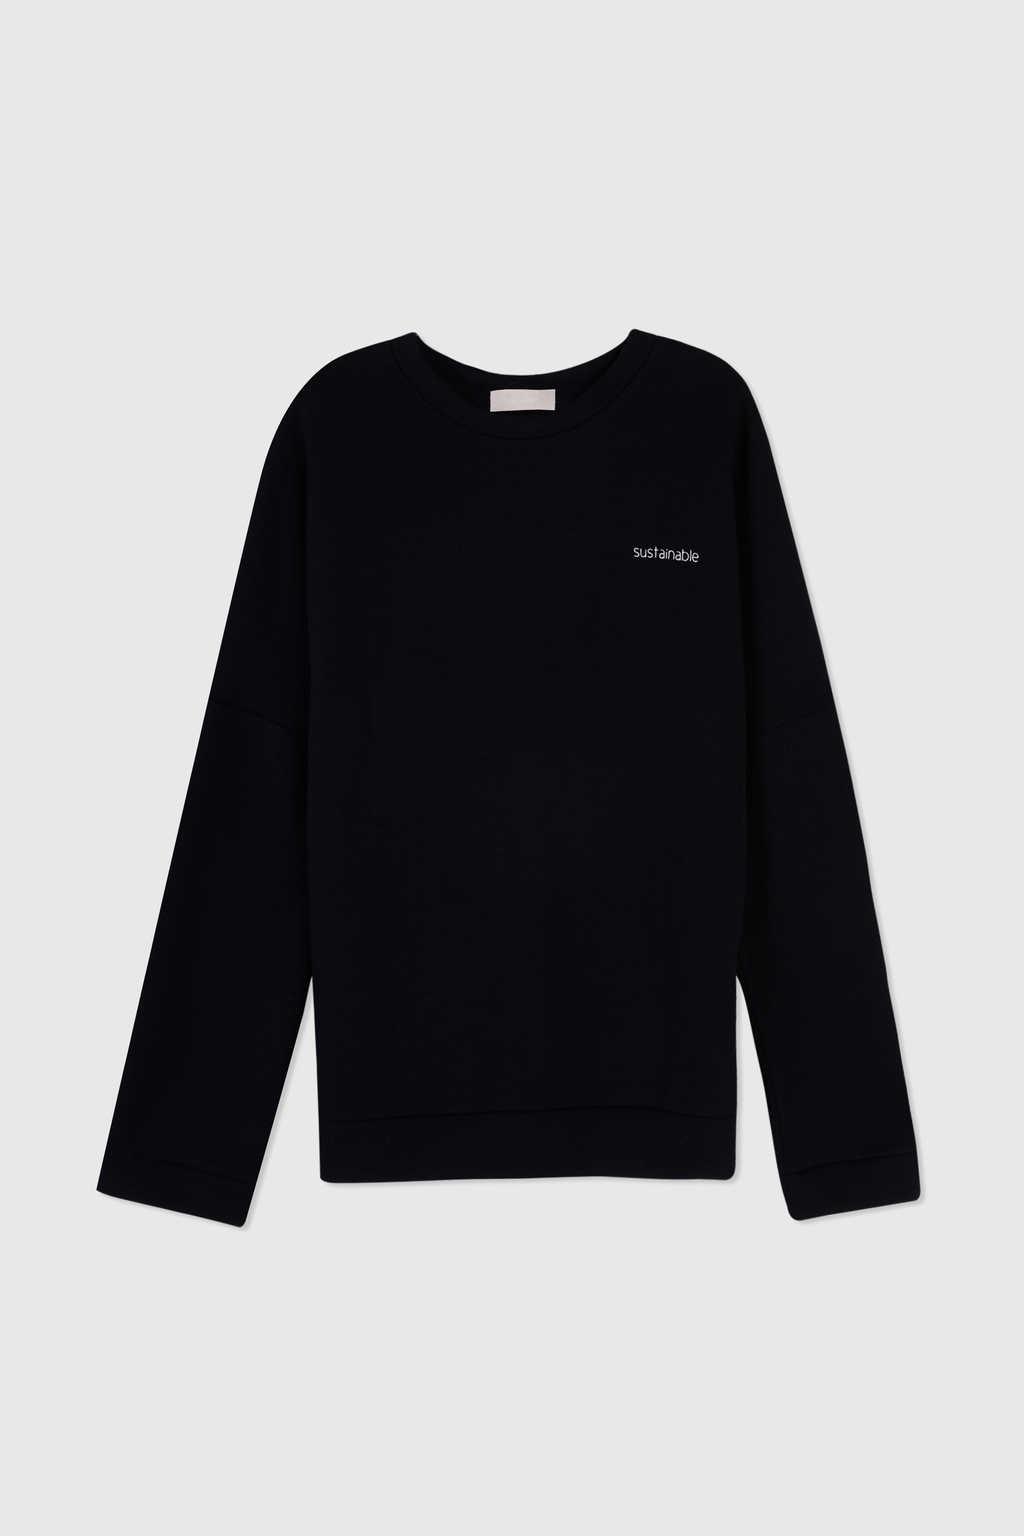 Sweatshirt 3302 Black 12